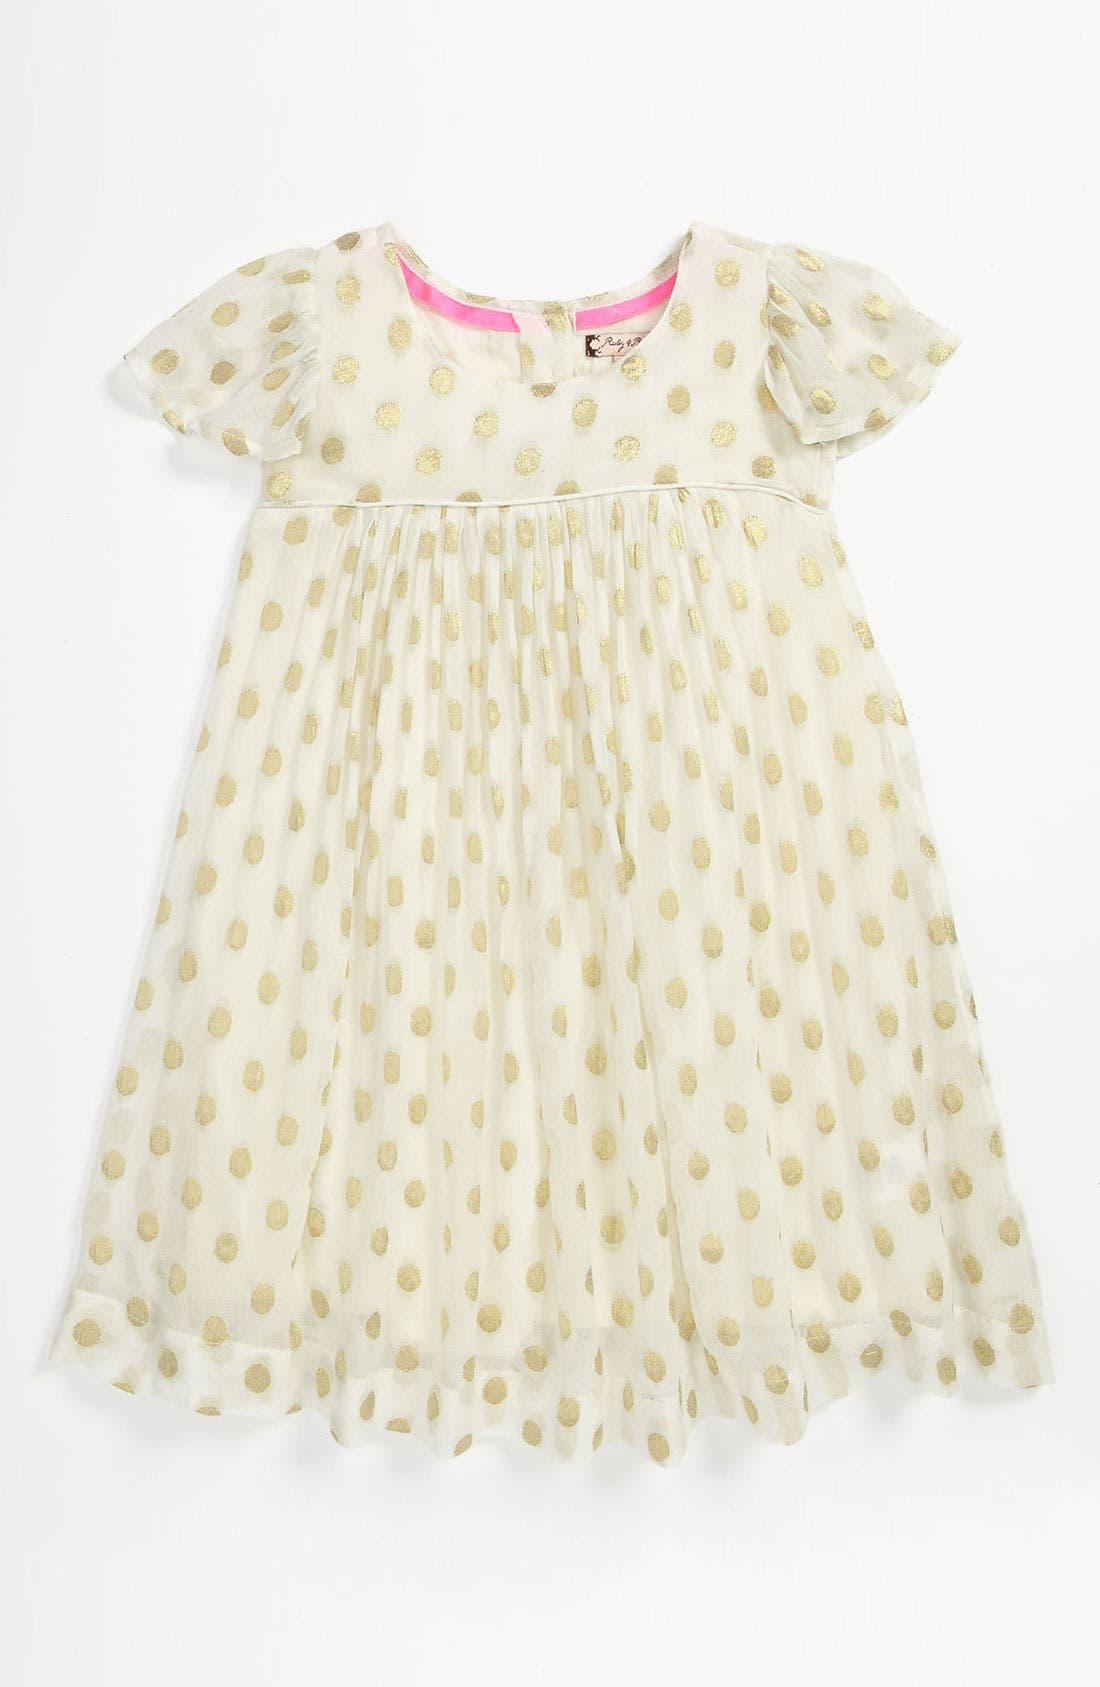 Alternate Image 1 Selected - Ruby & Bloom 'Tabitha' Dress (Toddler)